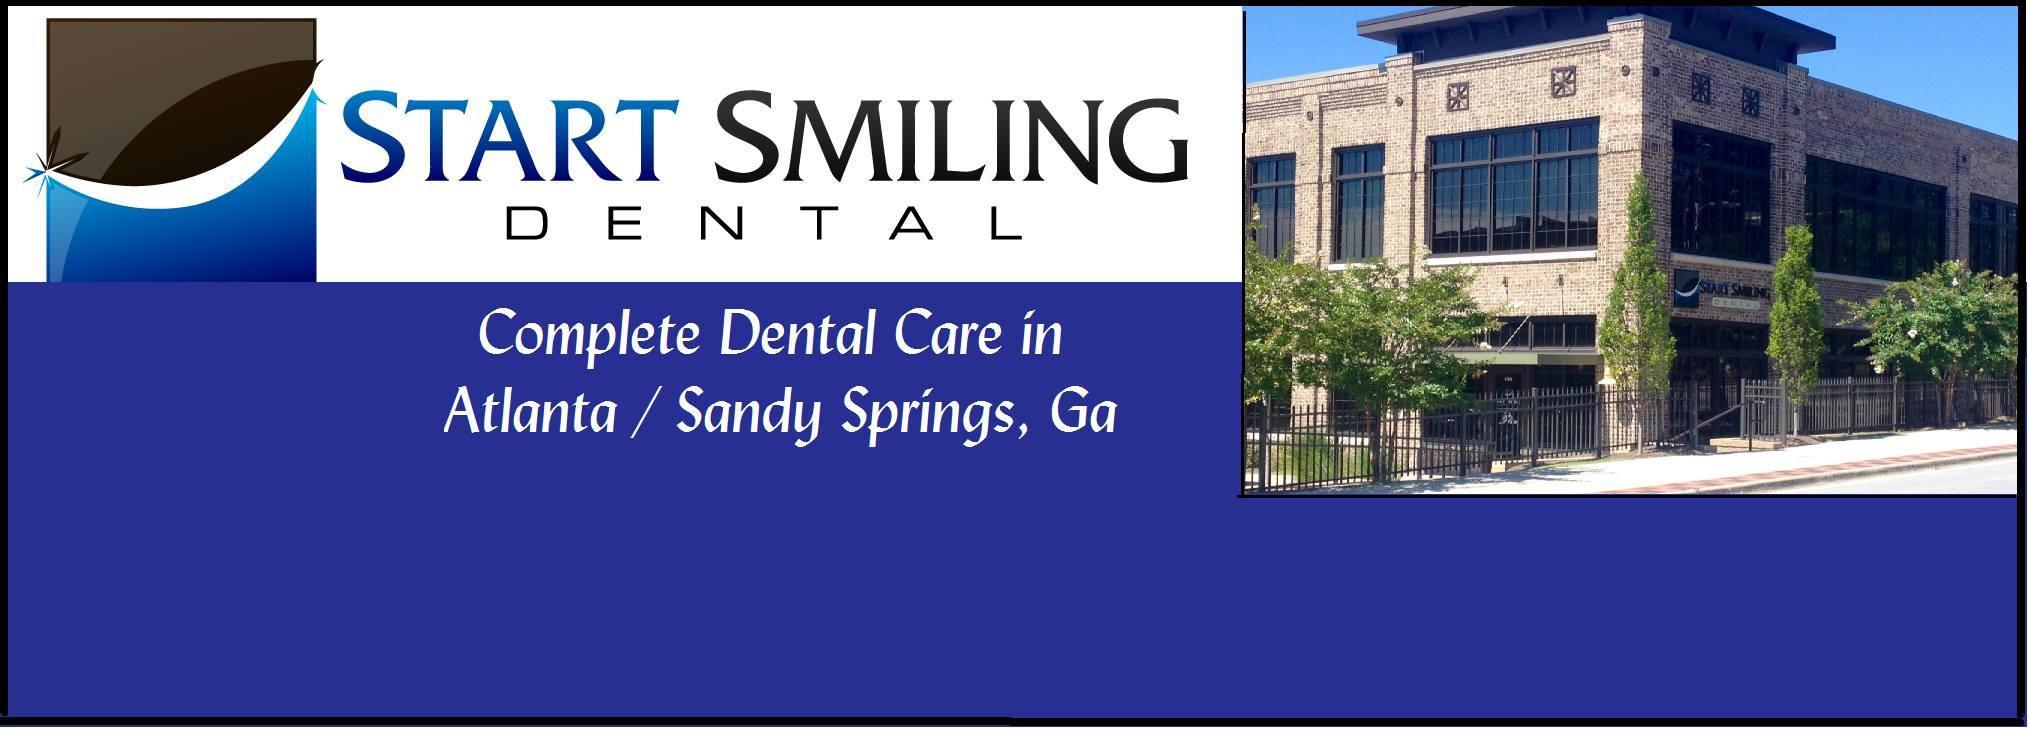 Start Smiling Dental | General Dentistry in 185 Allen Rd. - Sandy Springs GA - Reviews - Photos - Phone Number